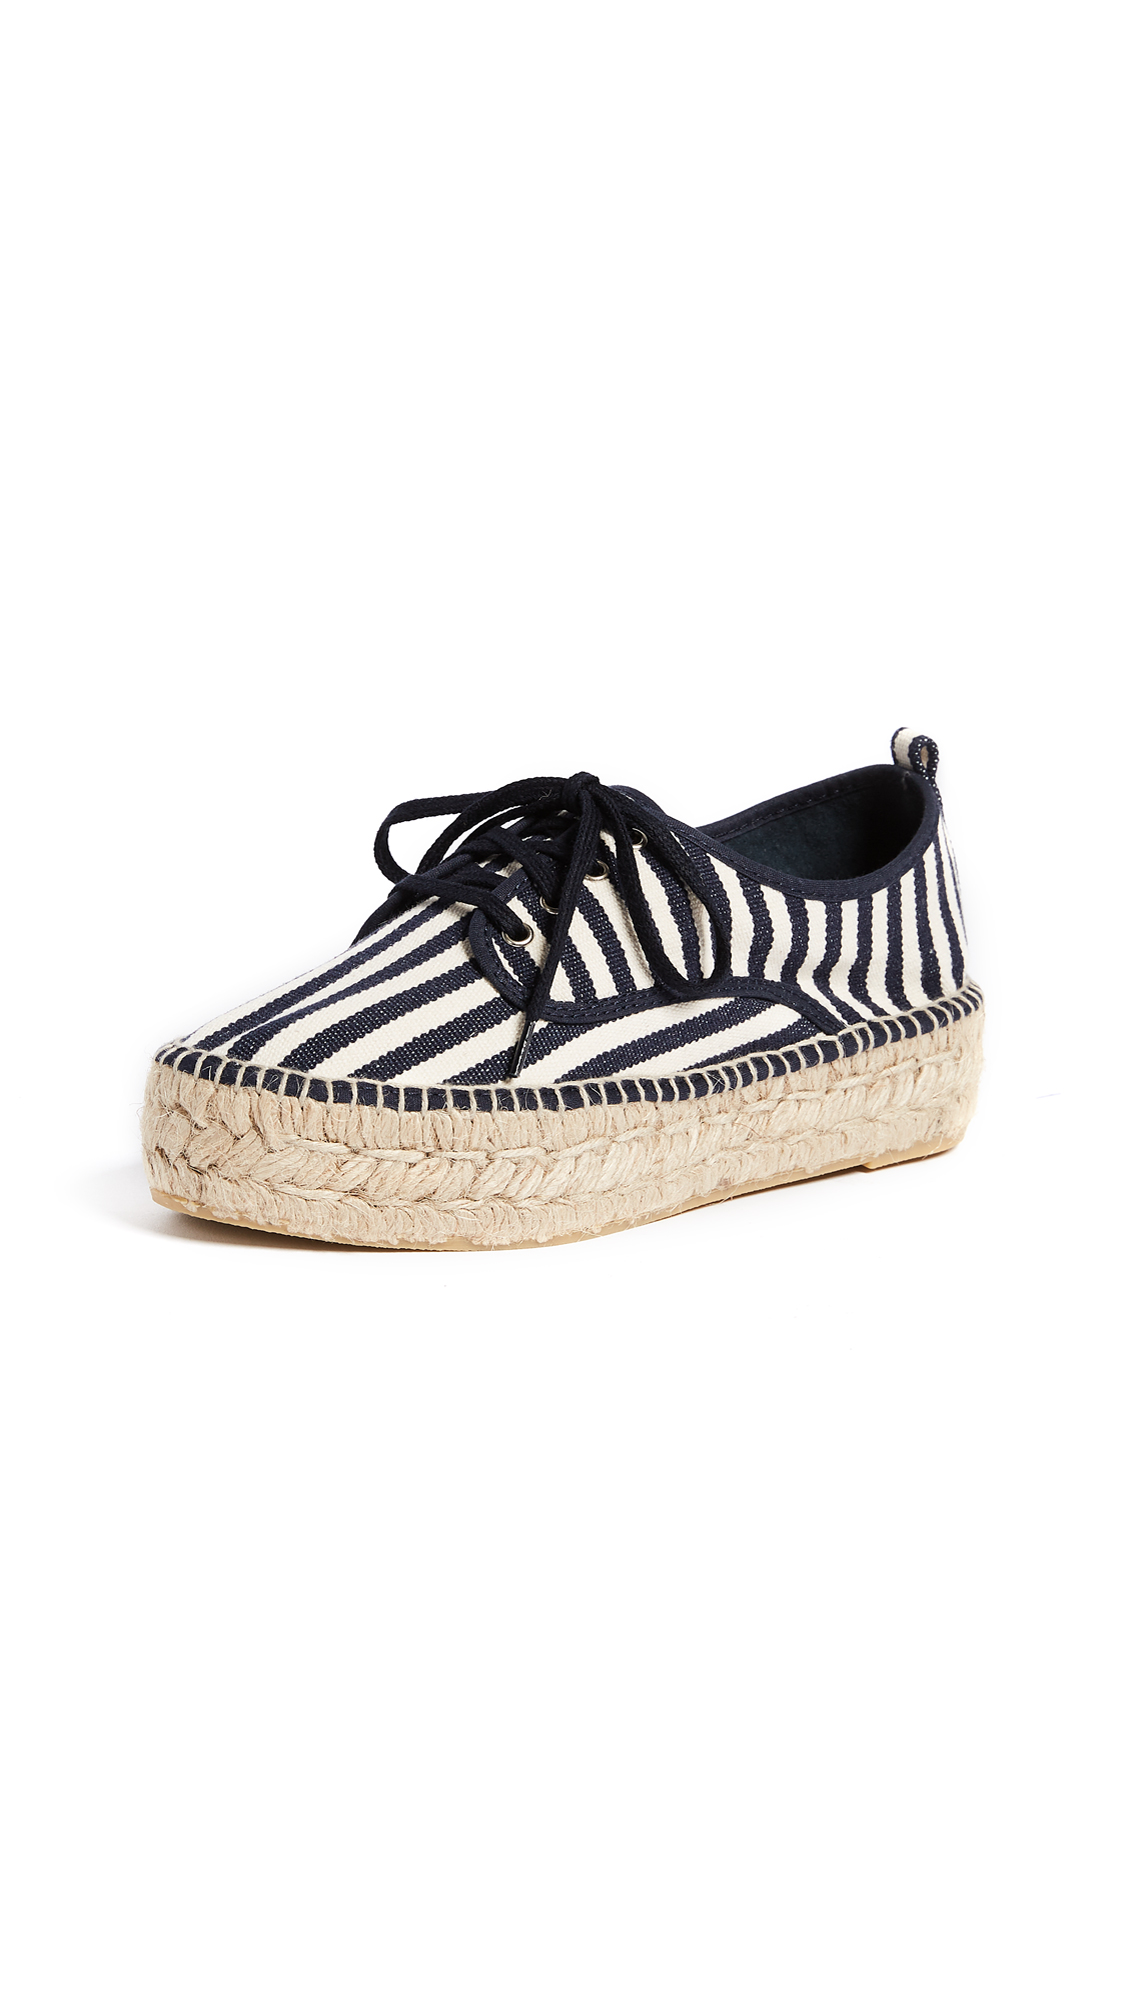 Loeffler Randall Alfie Espadrille Sneakers - White/Eclipse Stripe